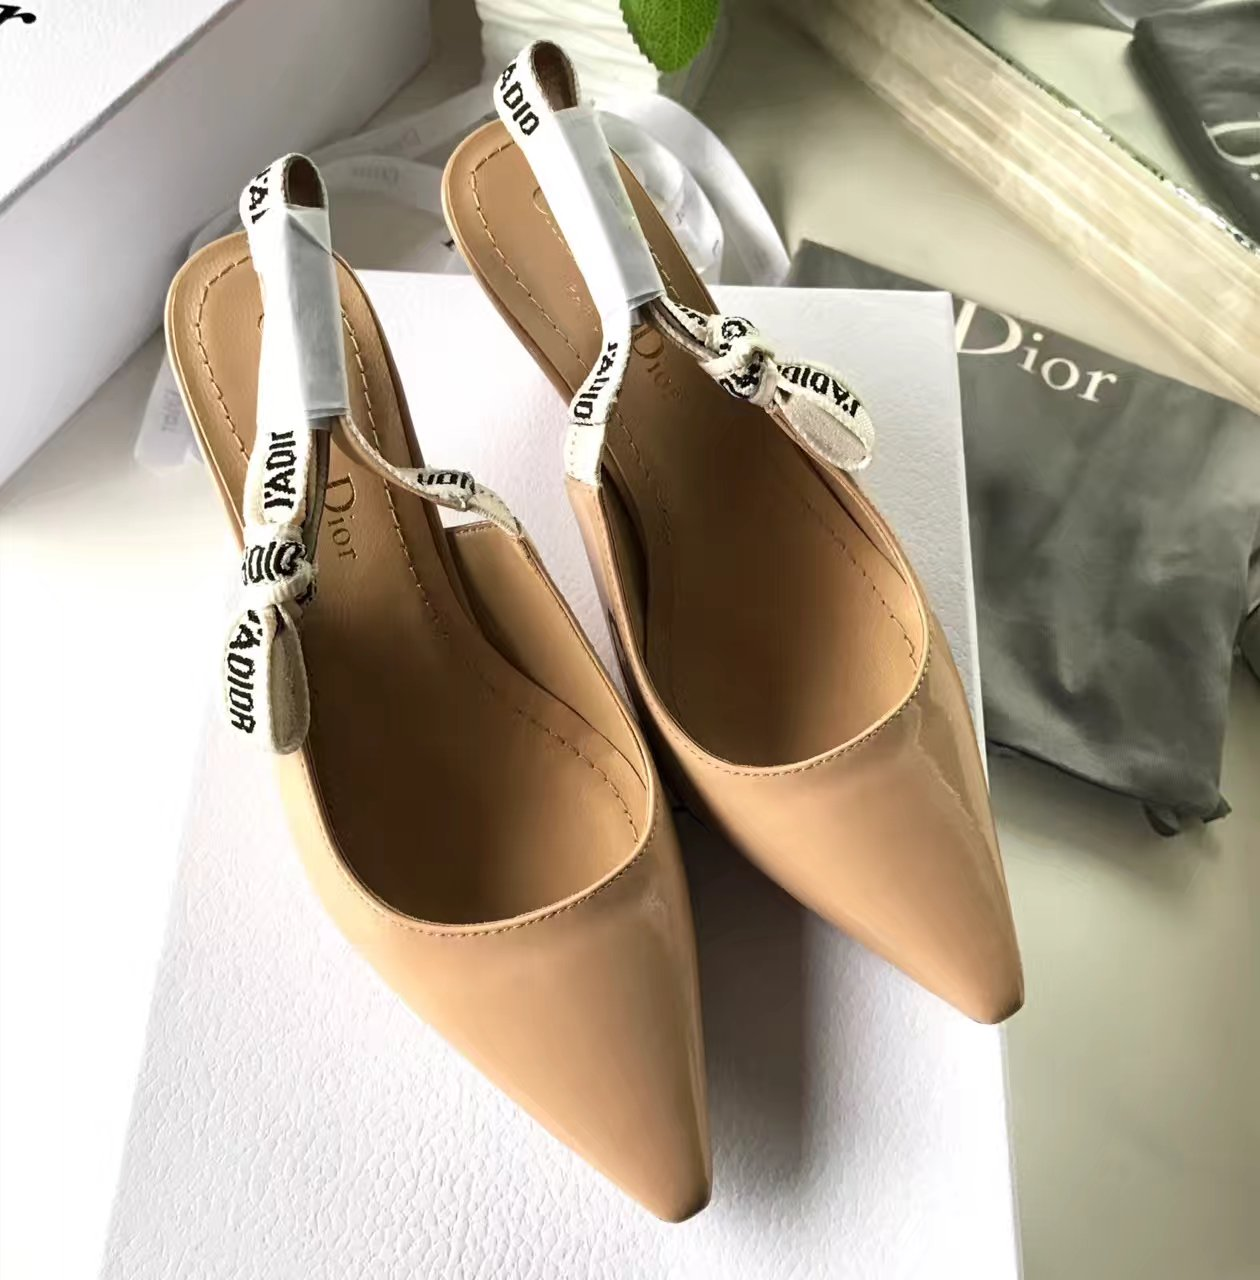 【DIOR凉鞋】2017迪奥最新走秀款凉鞋!